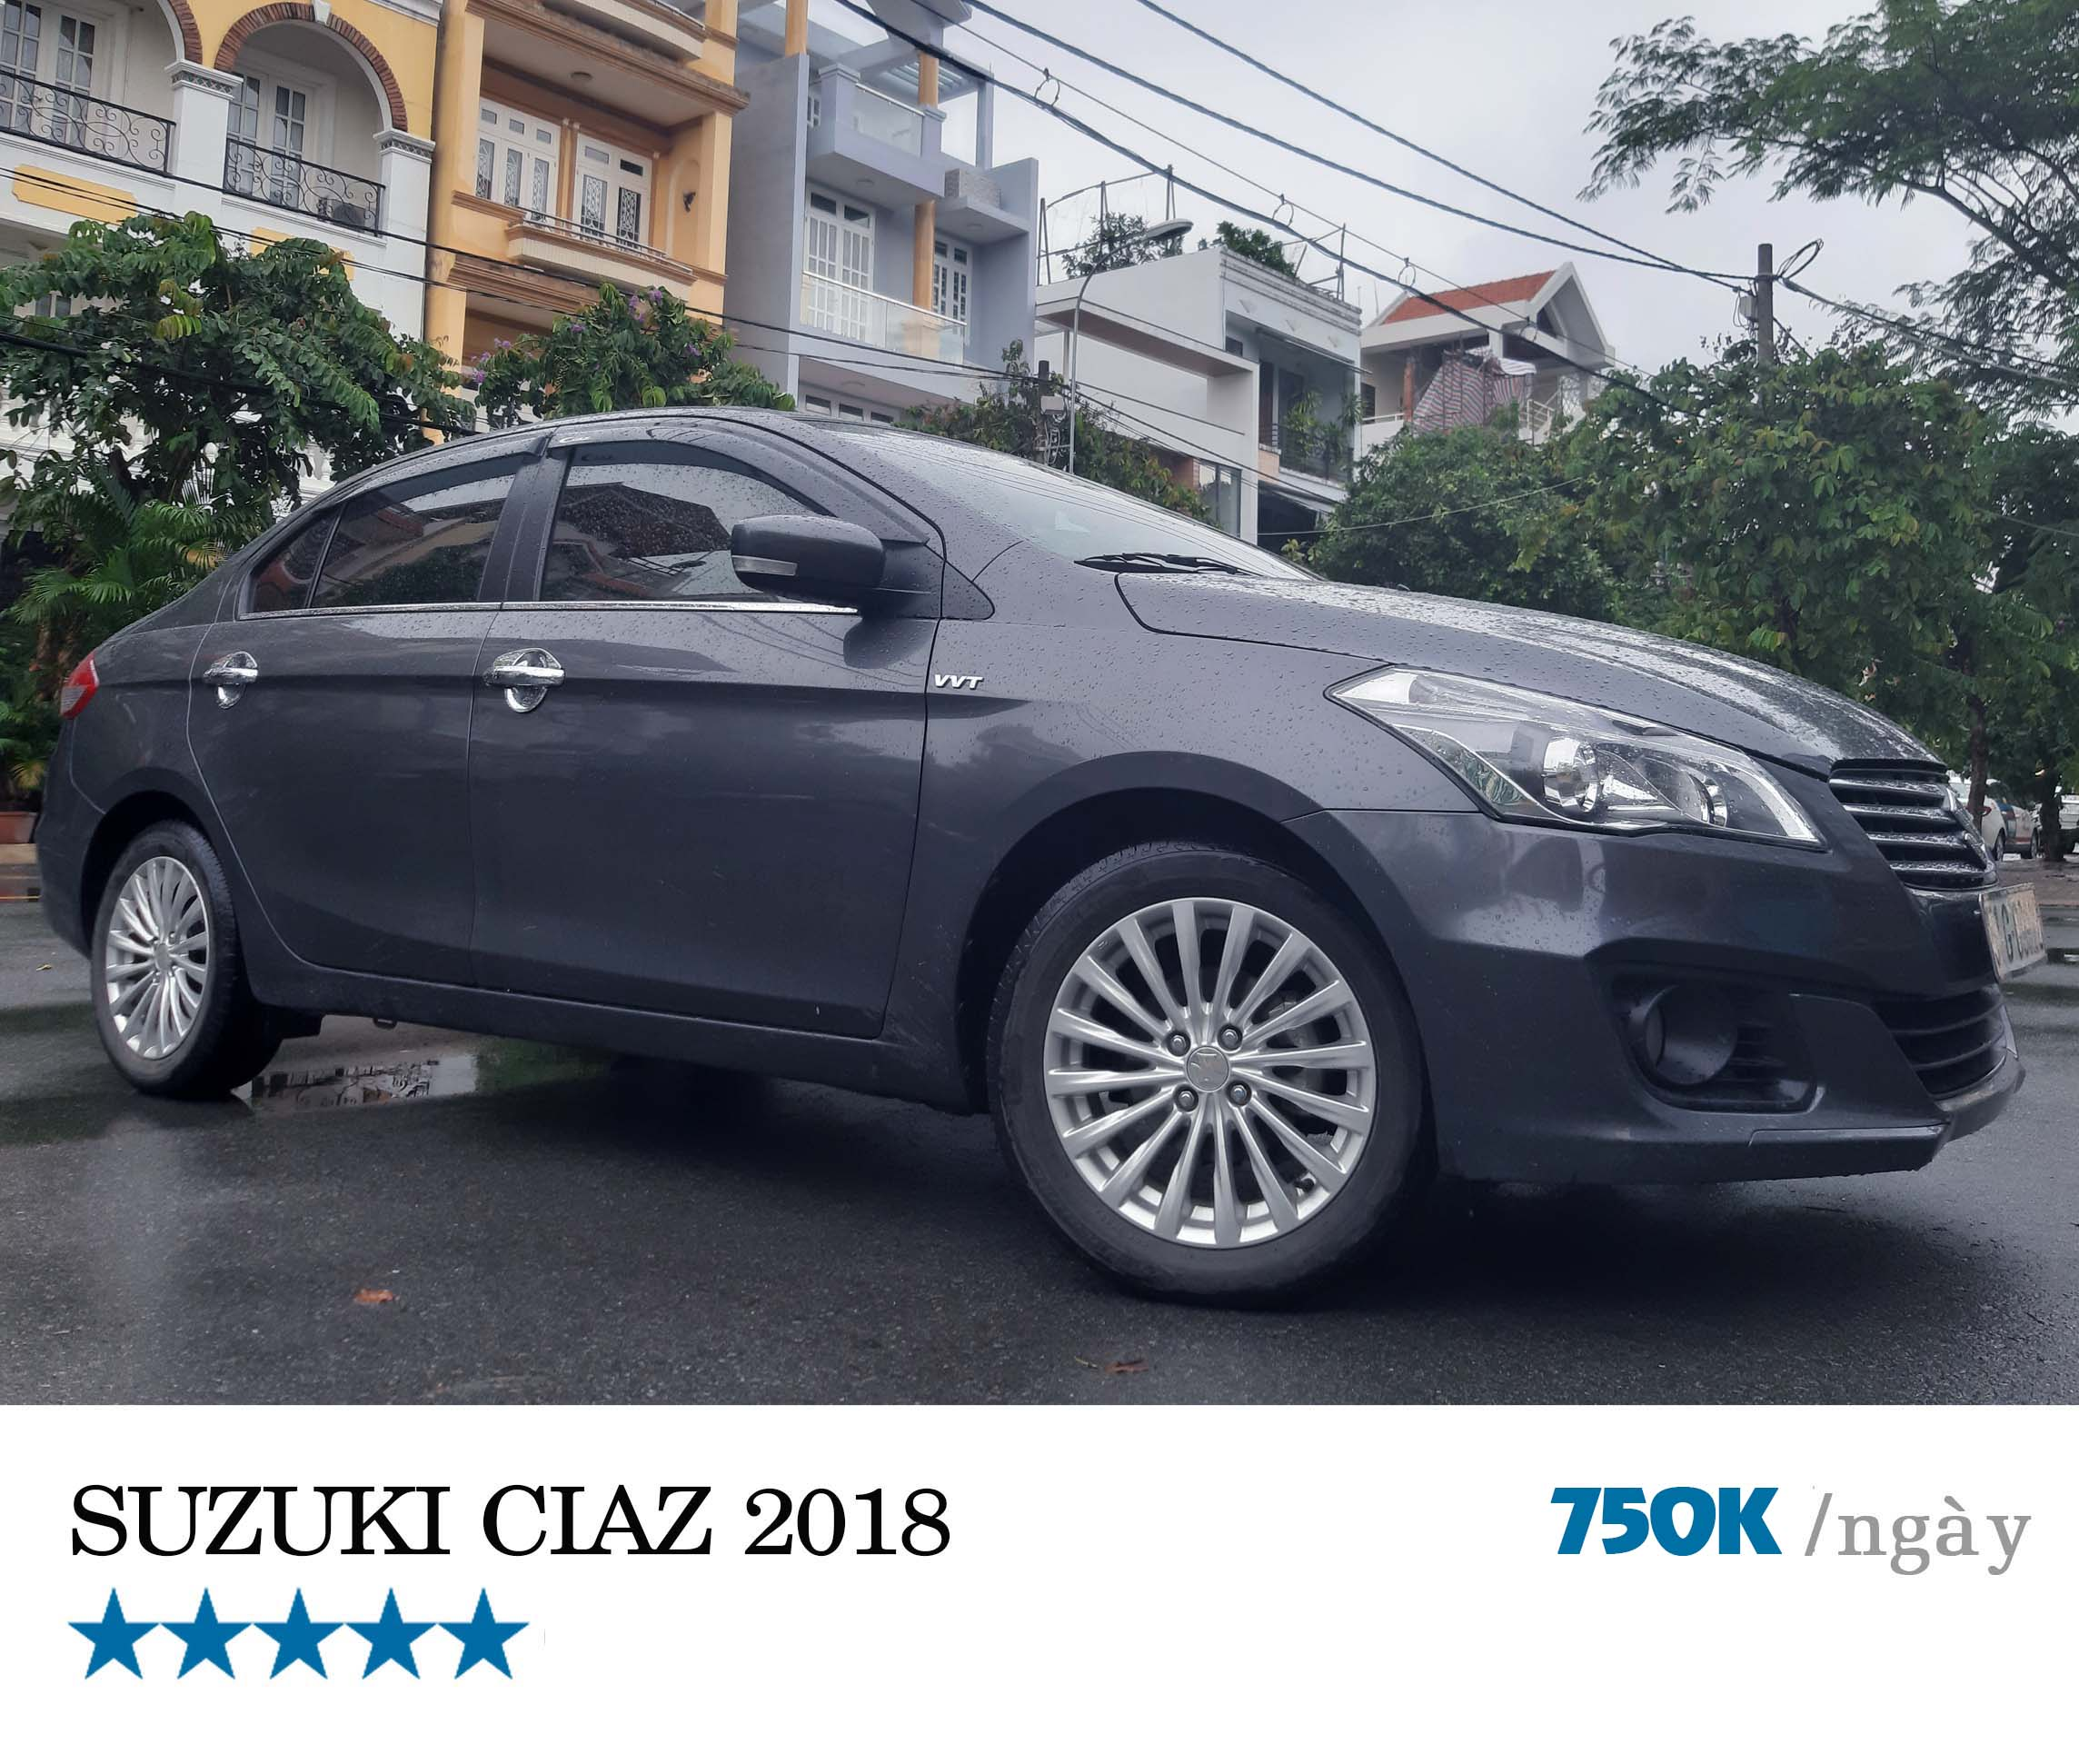 Cho thuê xe tự lái SUZUKI CIAZ 2018